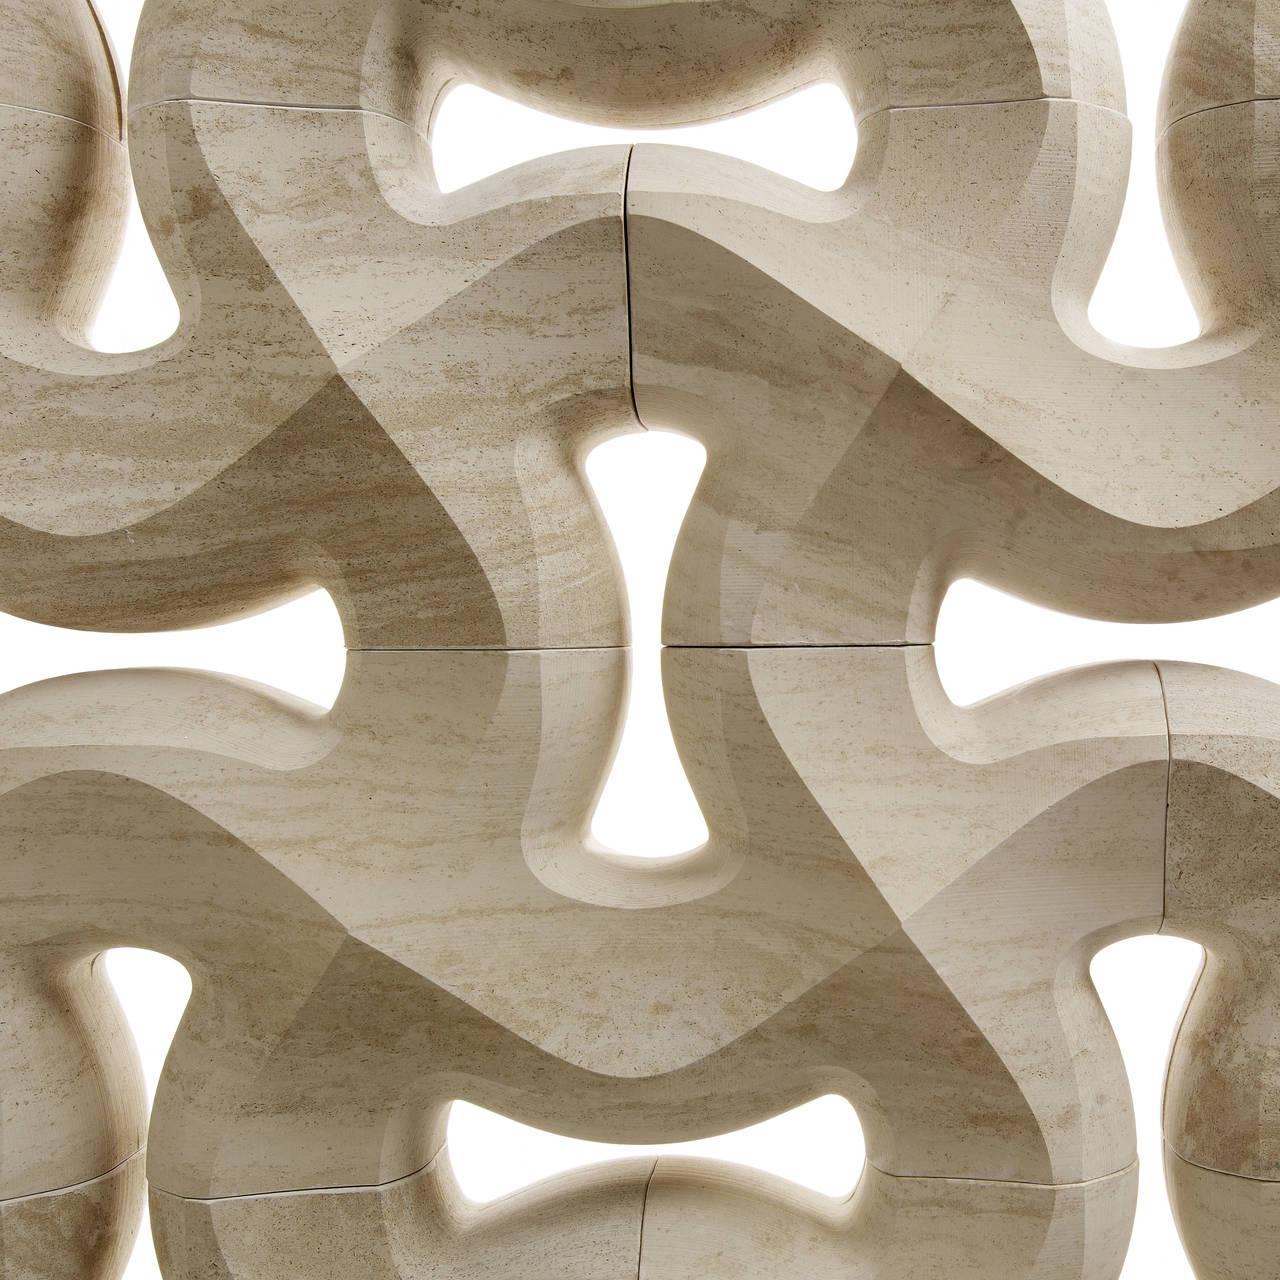 Traccia by Lithos Design